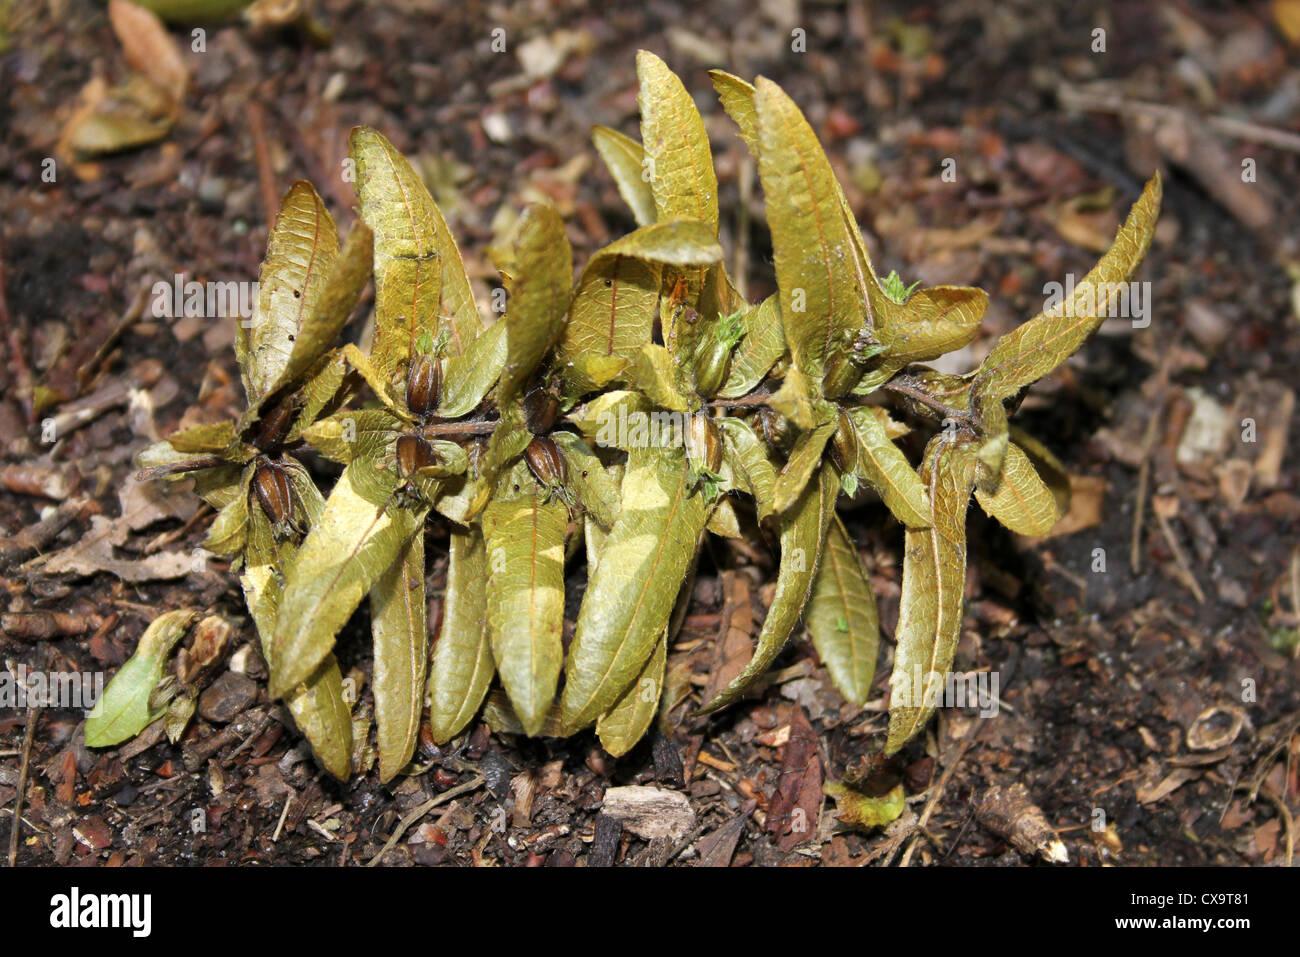 European Hornbeam Carpinus betulus Seeds - Stock Image